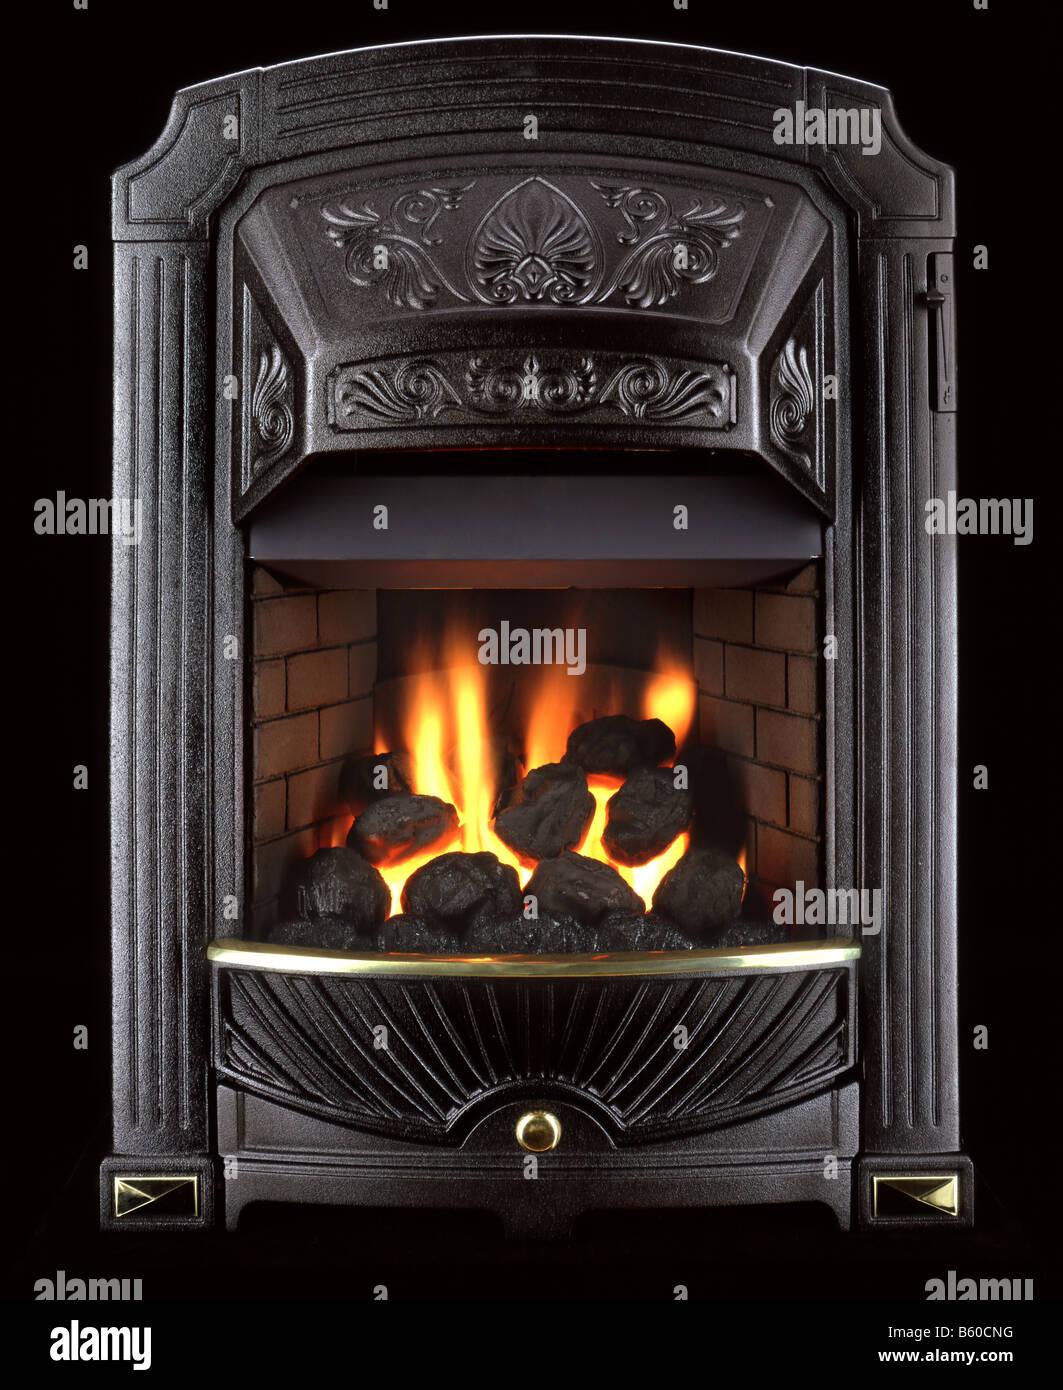 Black Metal Fireplace With Burning Coal Stock Photo 20908316 Alamy